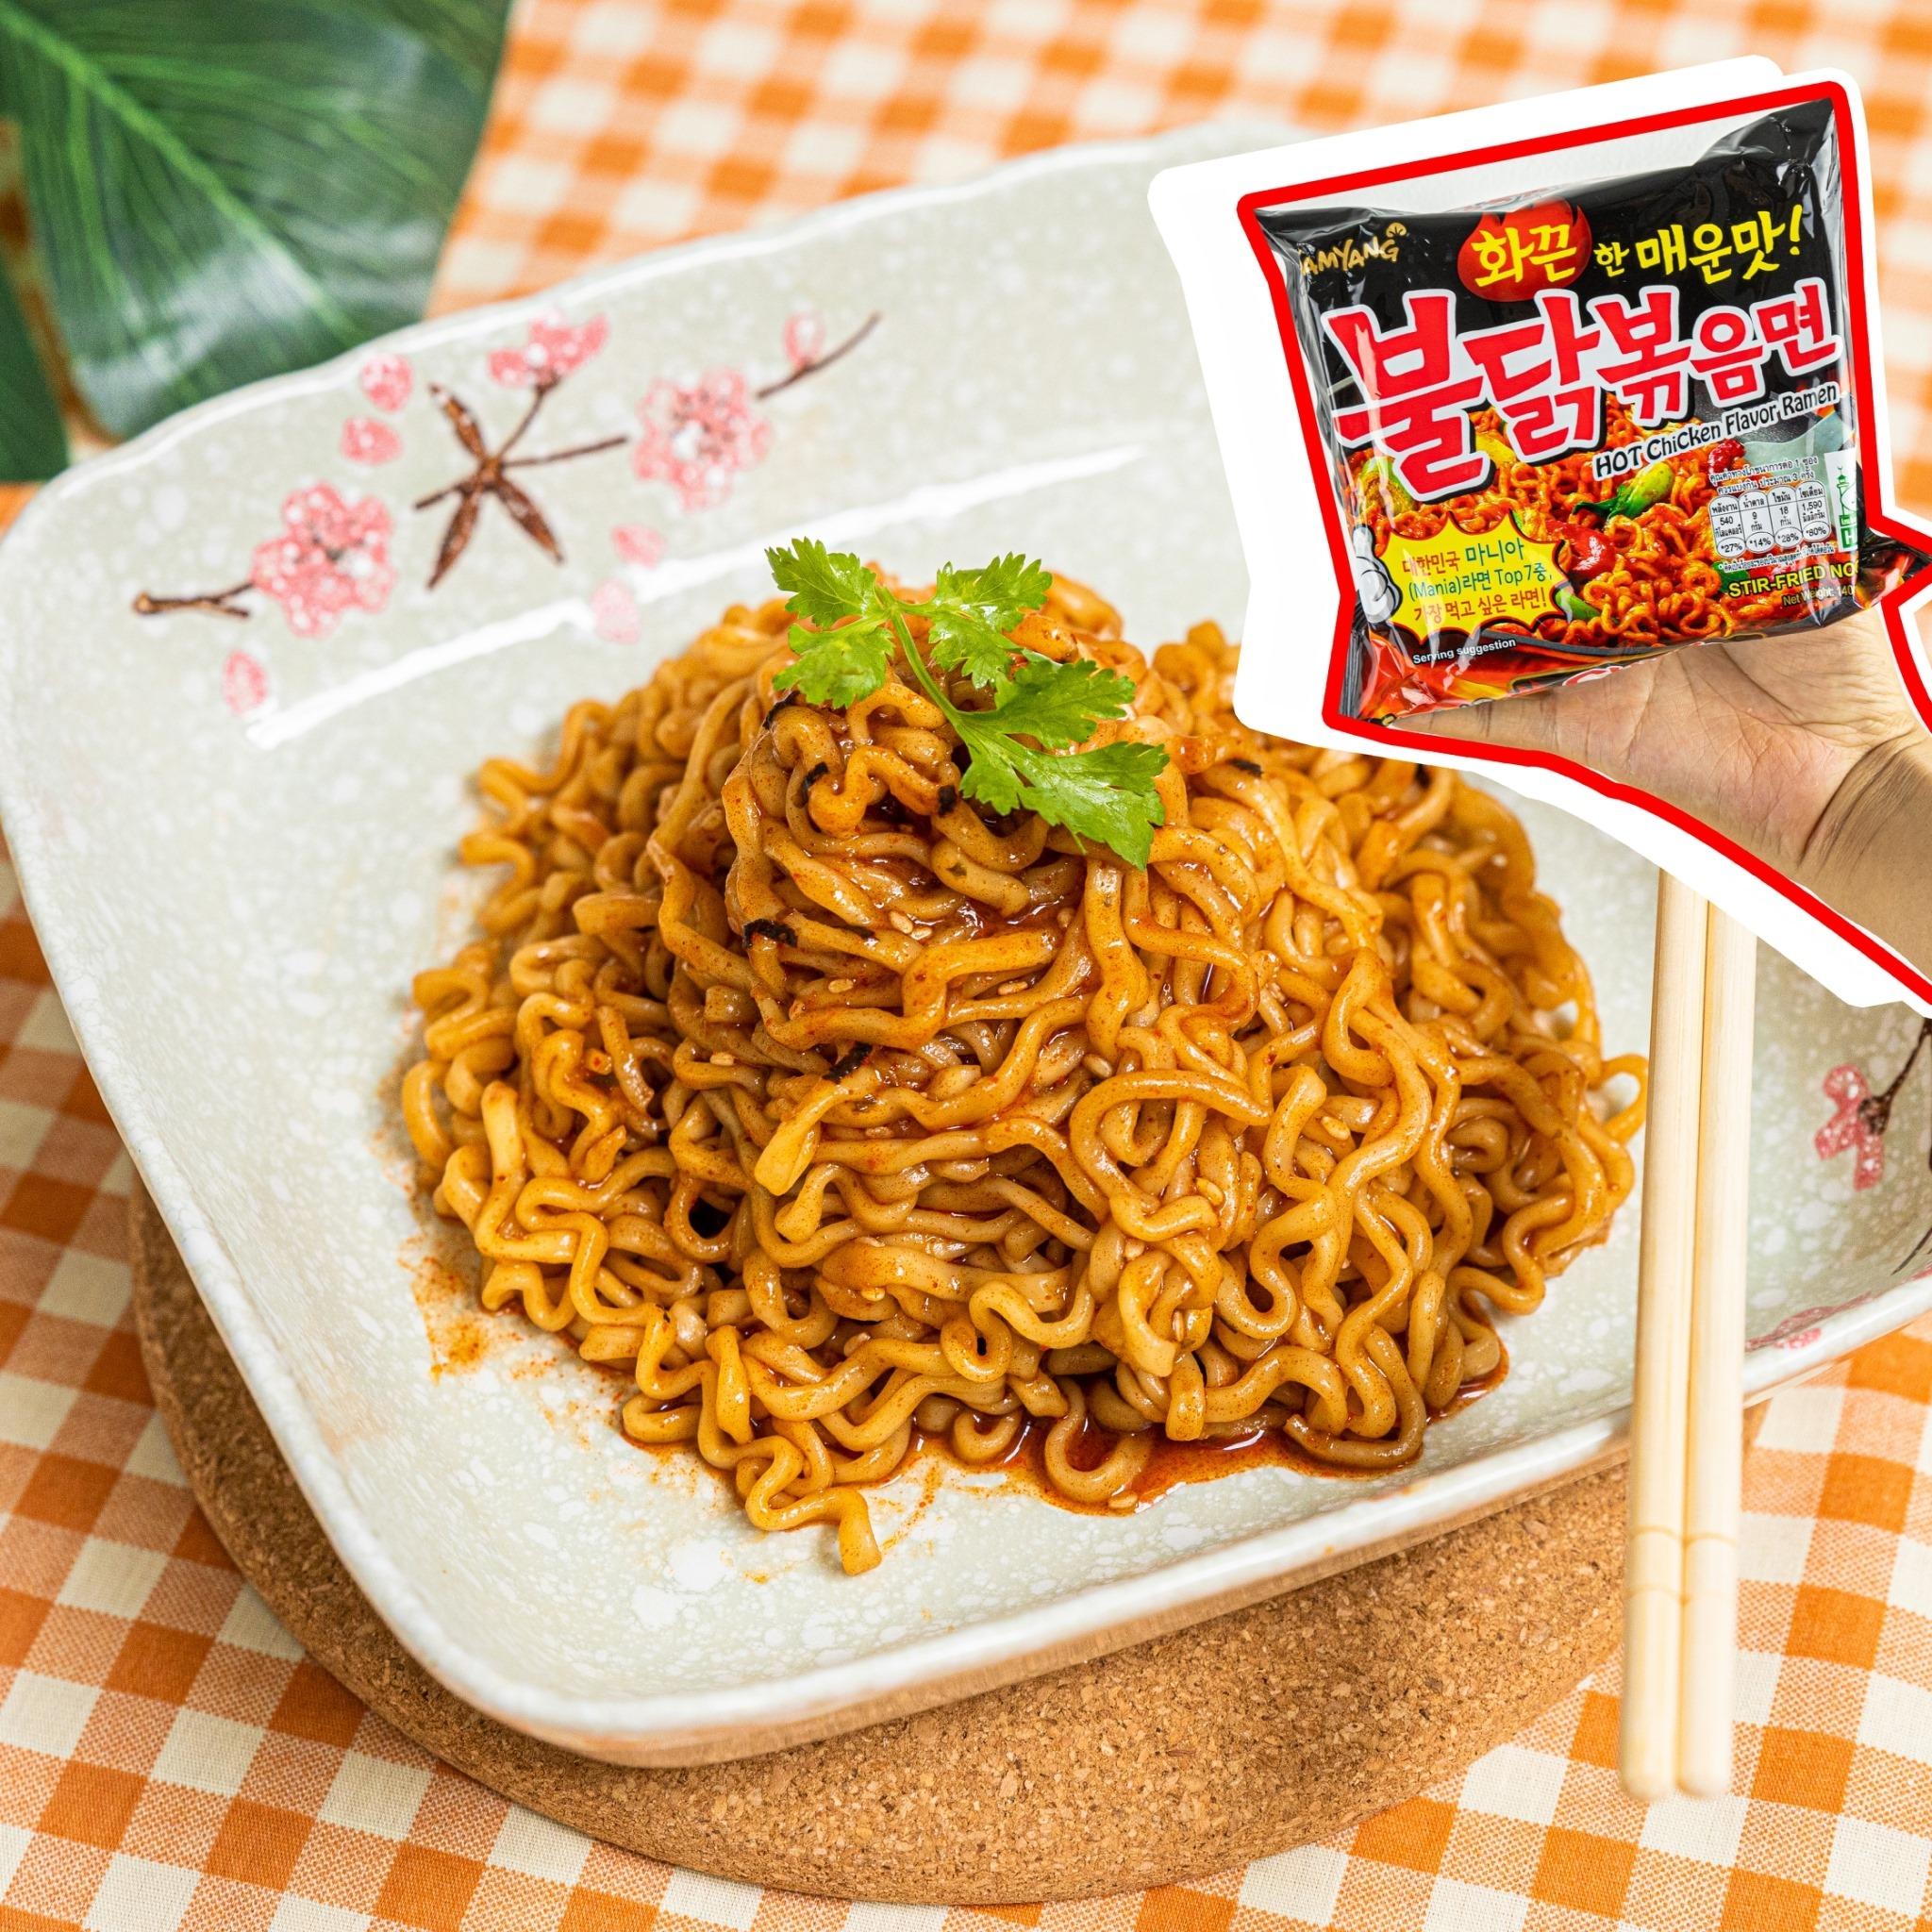 Samyang Hot Chicken Flavor Ramen